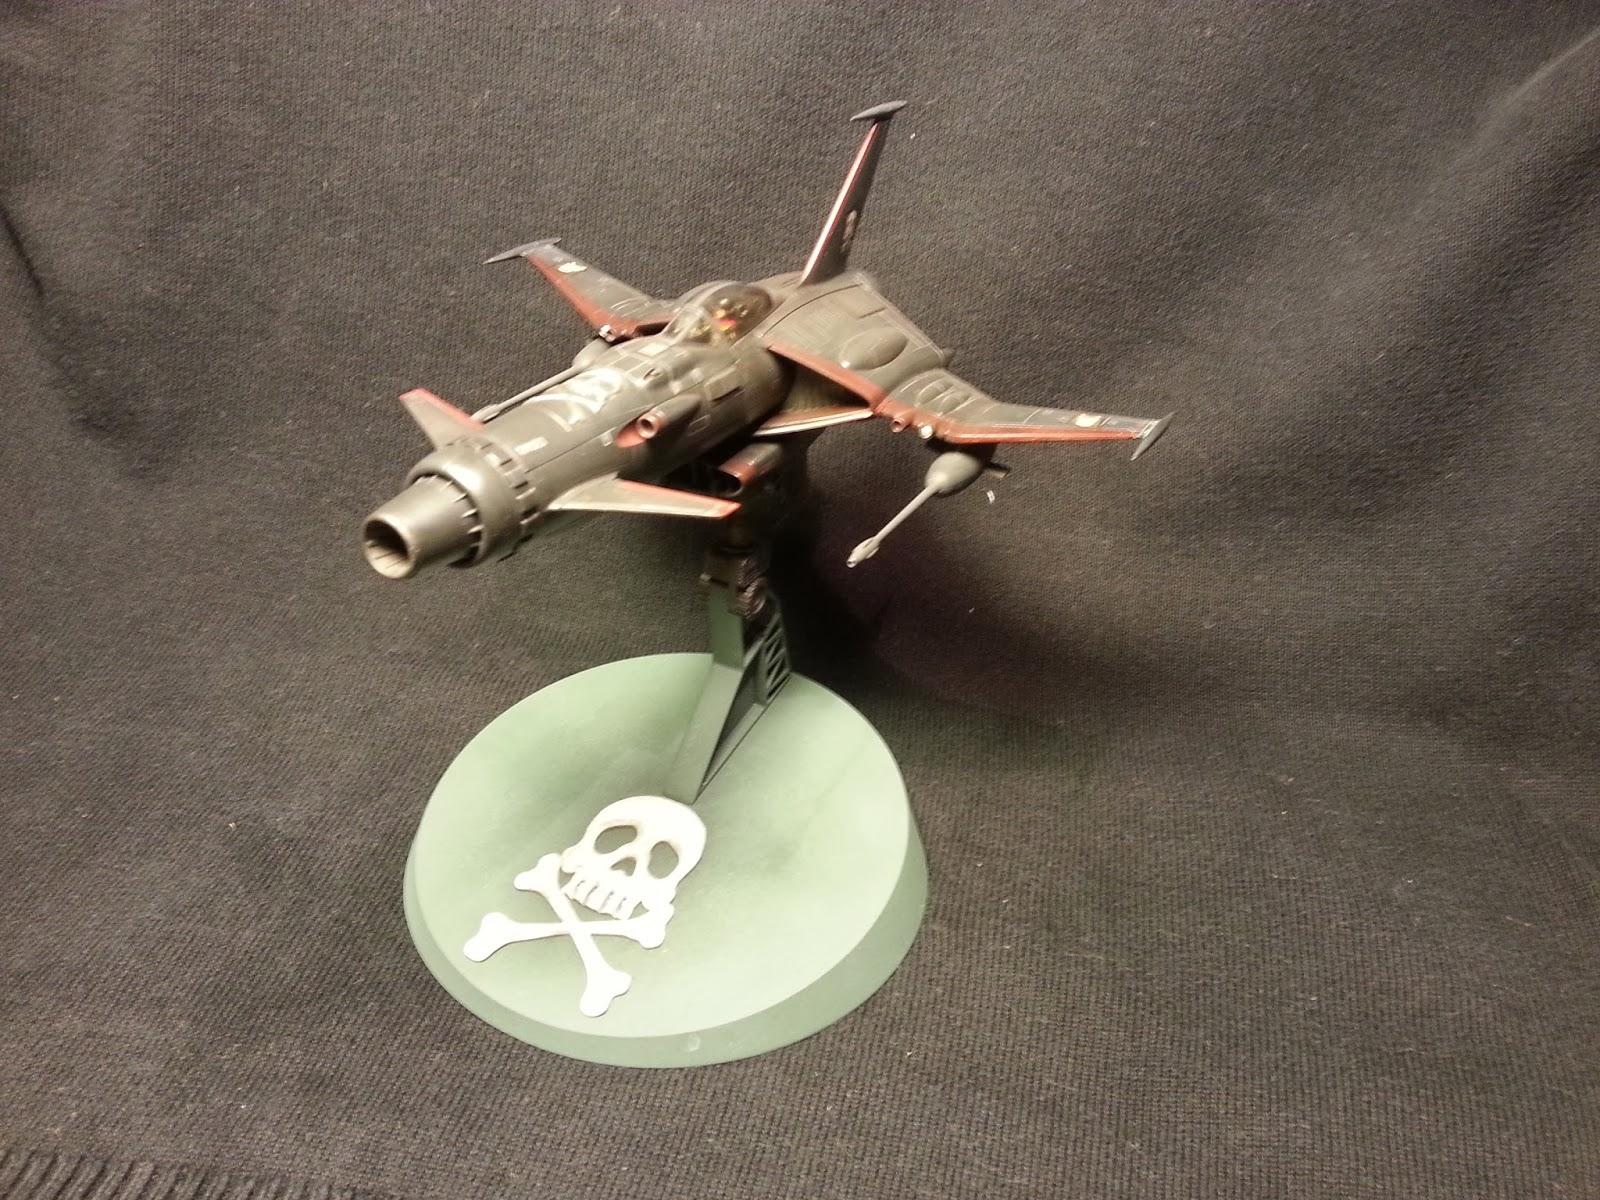 Hasegawa Captain Harlock 1/72 SPACE WOLF SW-190 HARLOCK ...